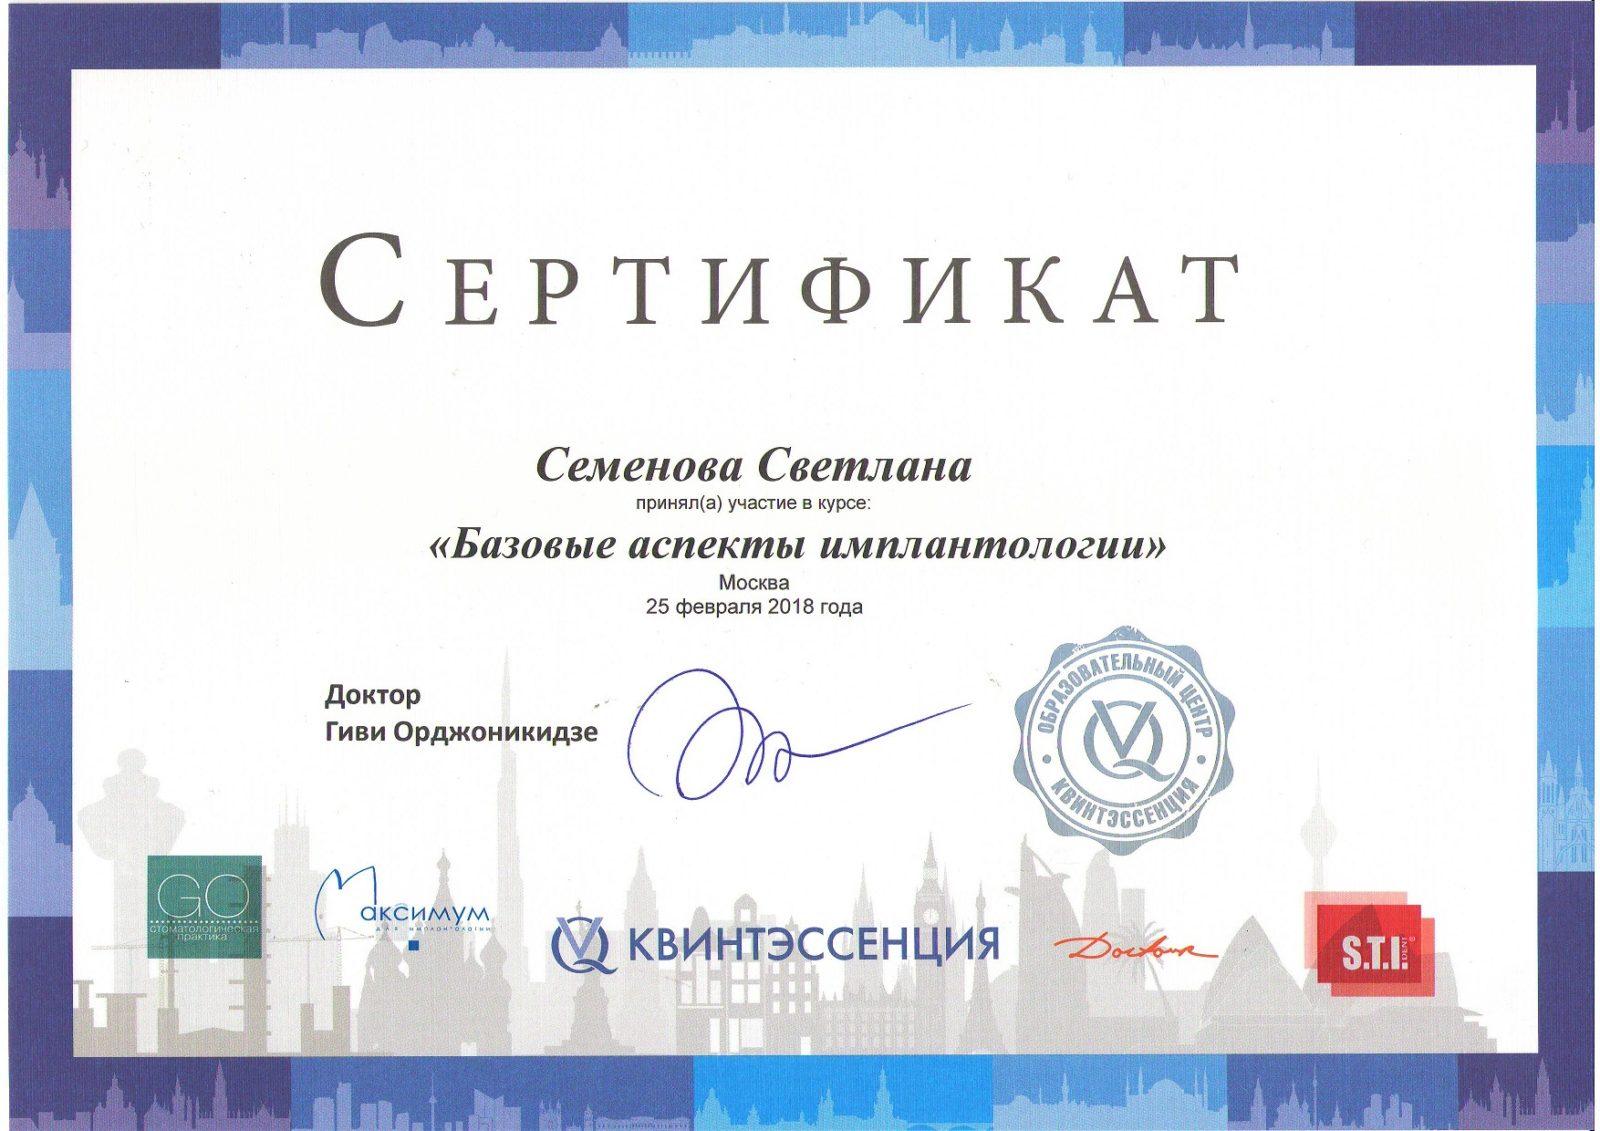 http://oris-vidnoe.ru/wp-content/uploads/2021/06/semenova3.jpg